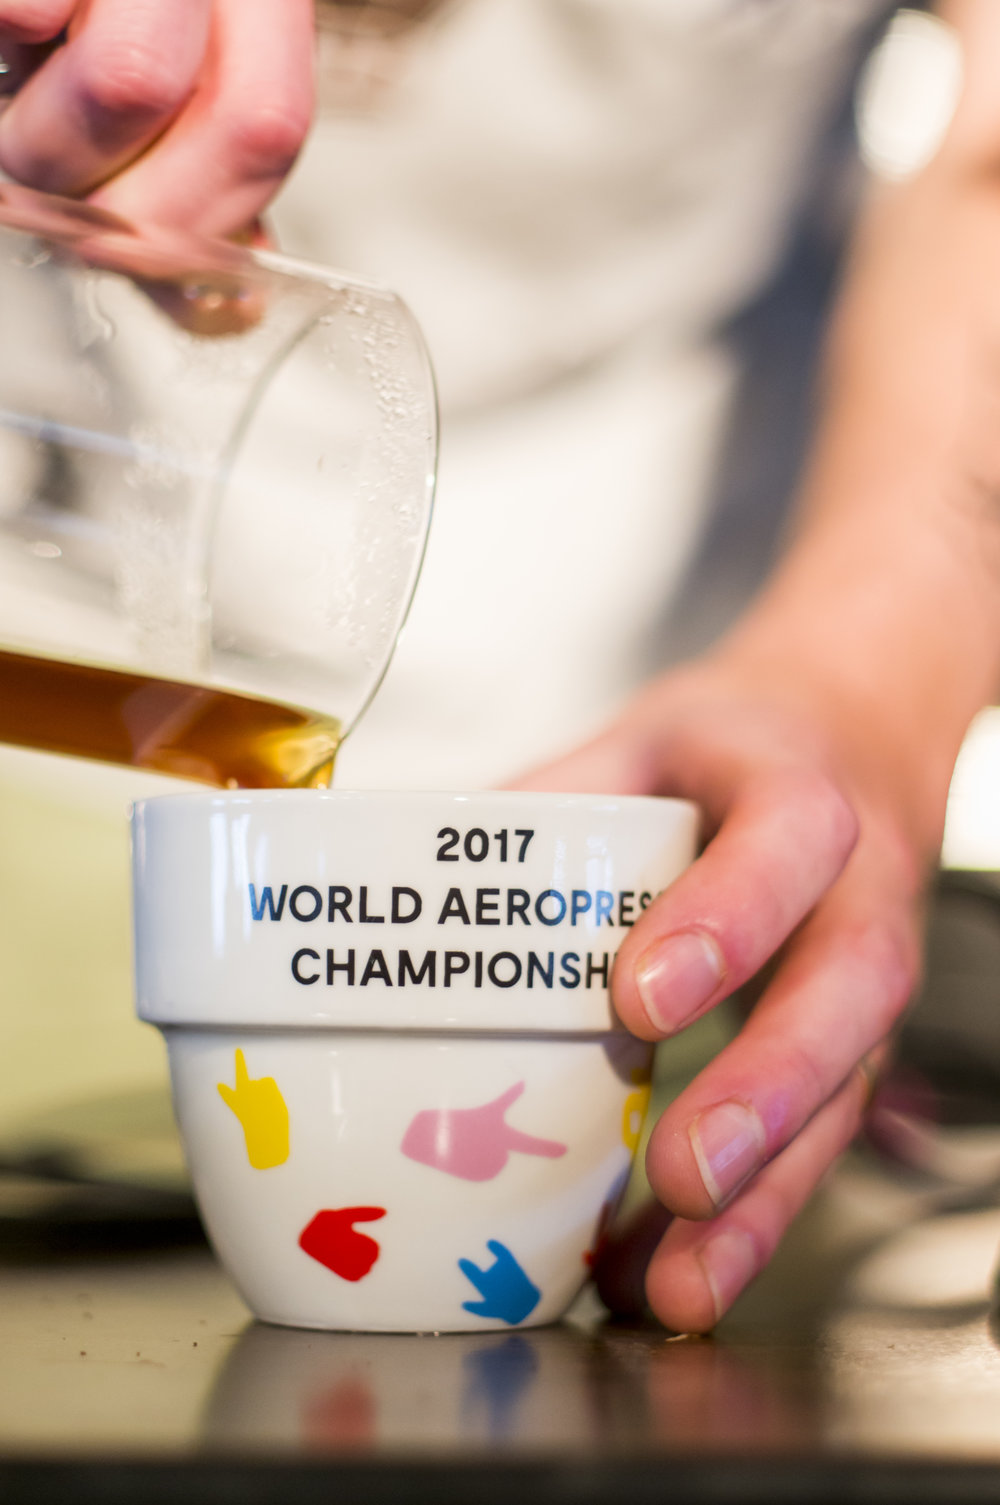 aeropress_tournament.1002.jpg